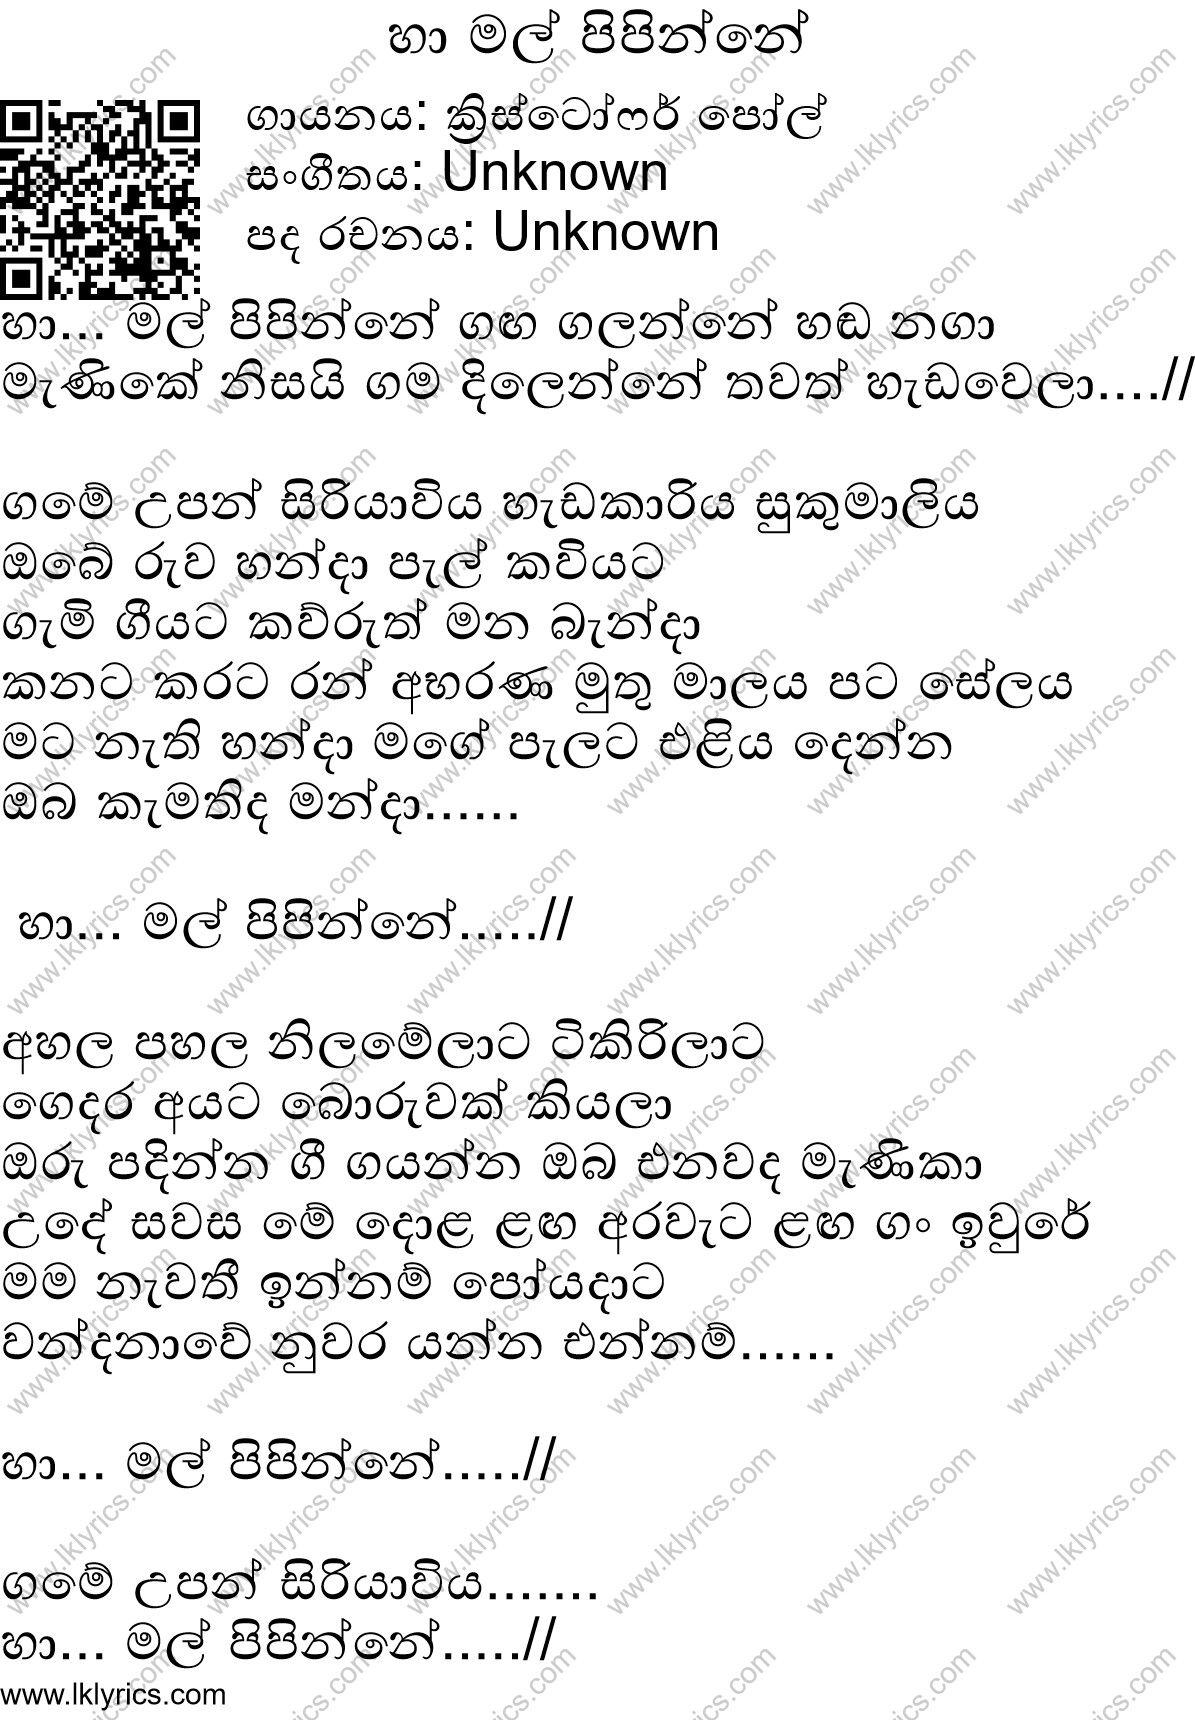 Pin By Sandali Hansani On Song Lyrics Songs Lyrics Song Lyrics